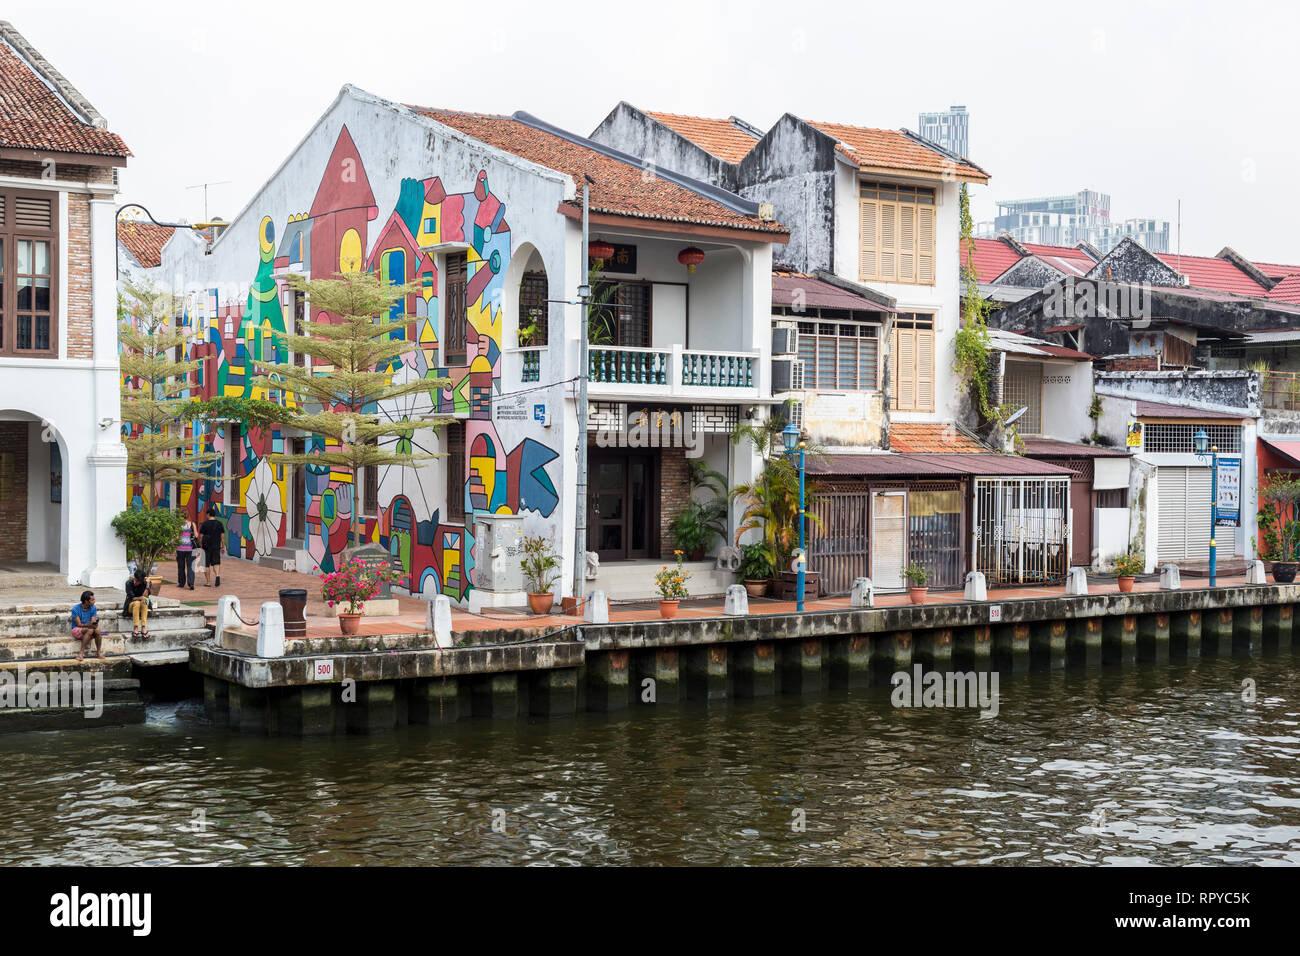 Old Shophouses Line the Melaka River, Melaka, Malaysia. - Stock Image